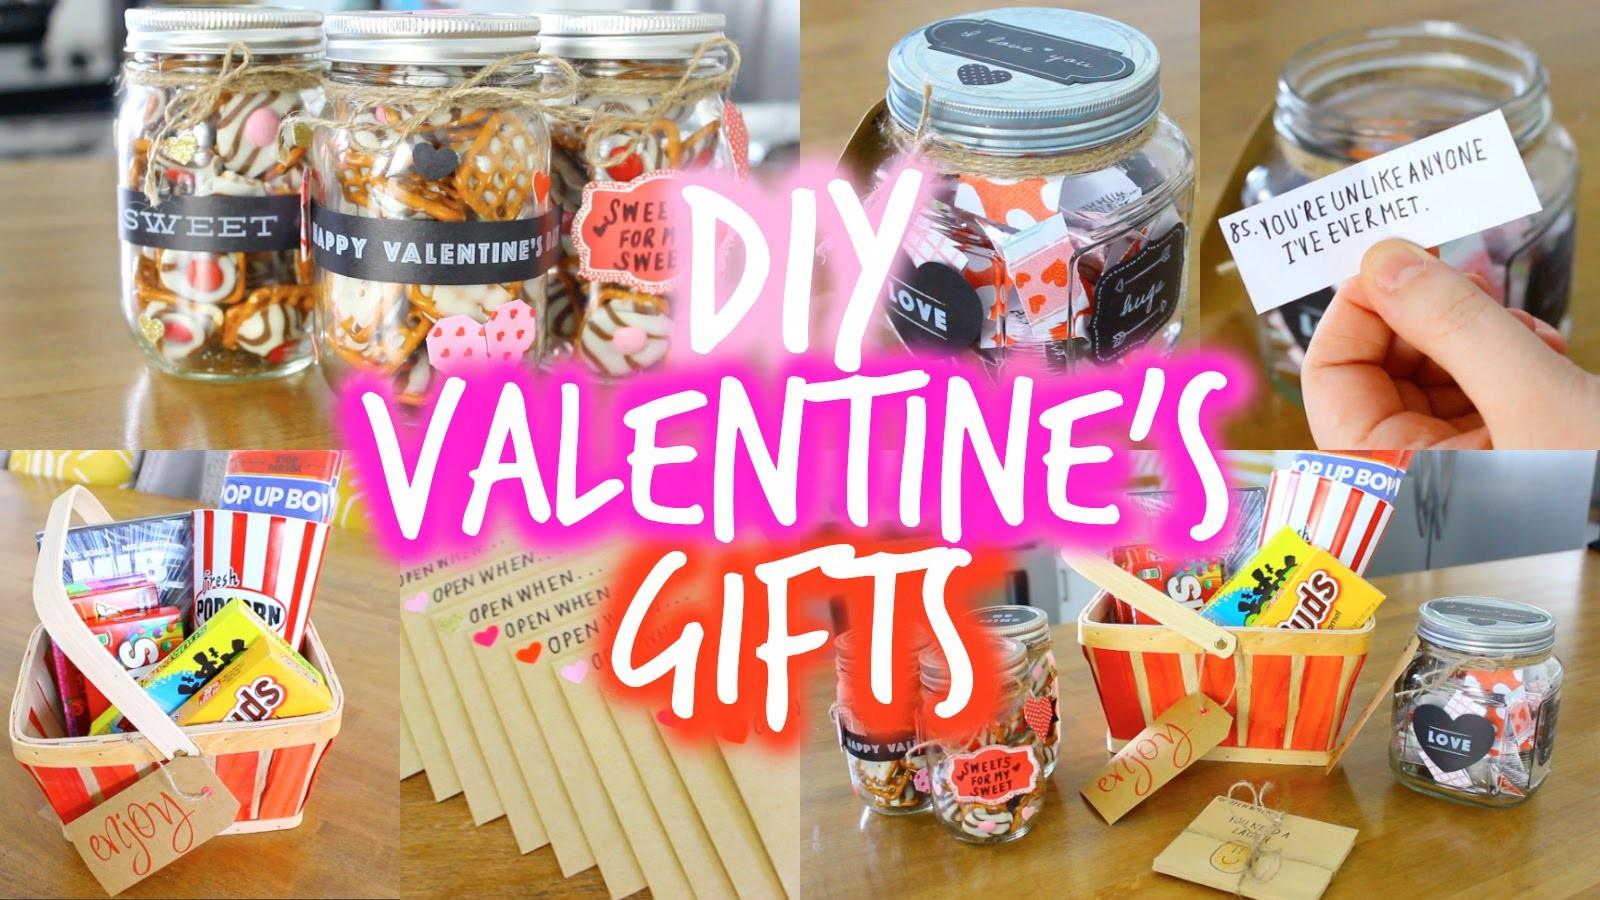 EASY DIY Gift Ideas for Your Boyfriend or Husband!